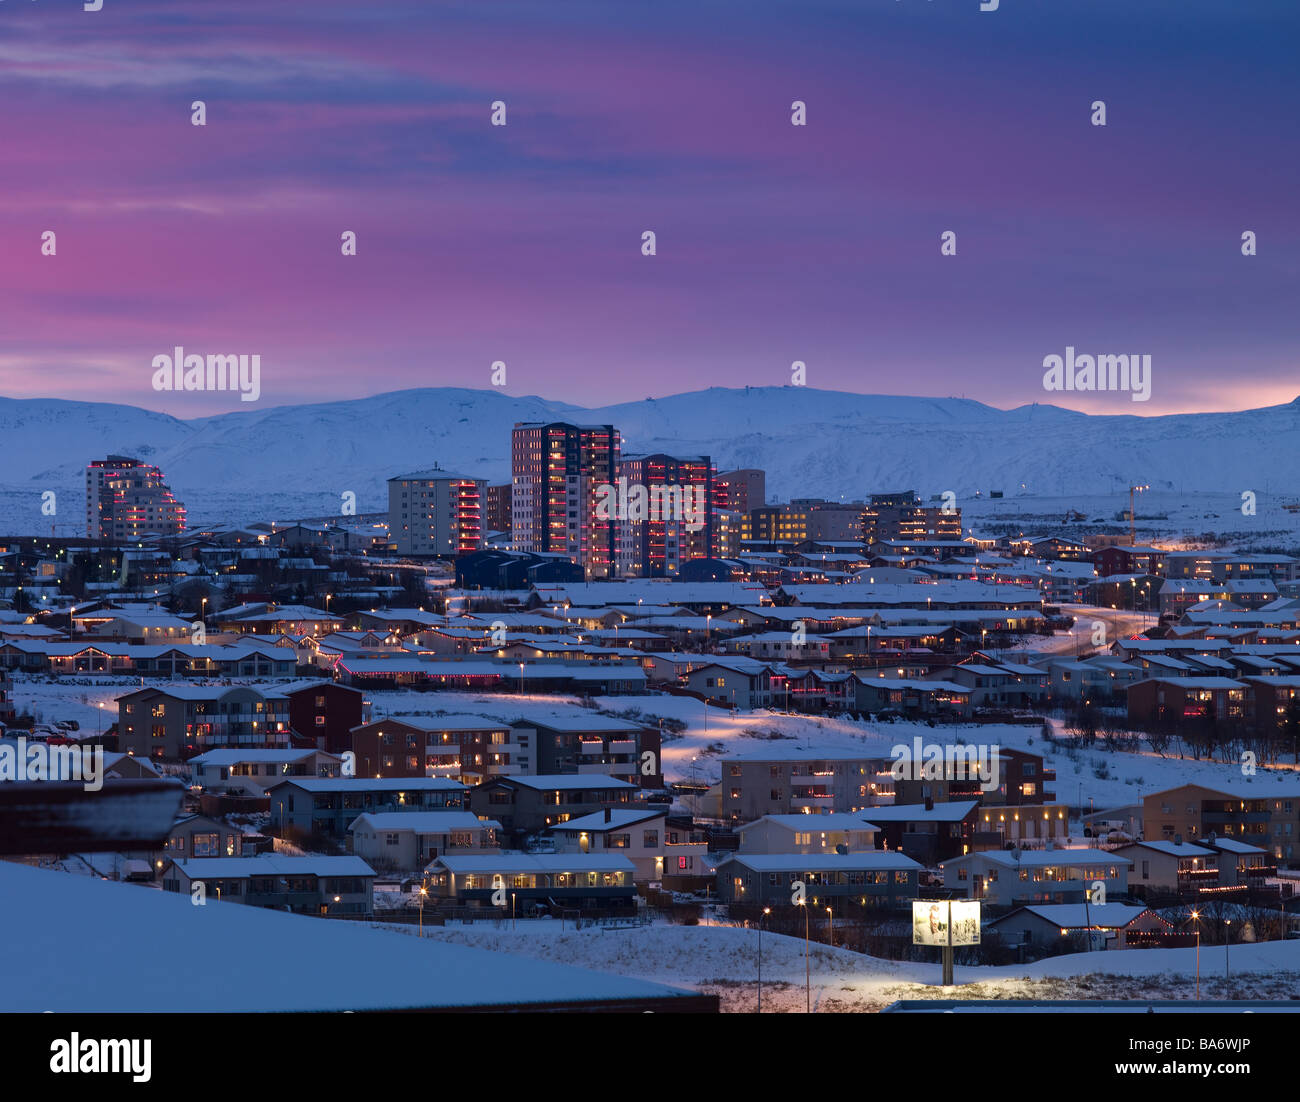 Kopavogur, suburb of Reykjavik, Iceland Stock Photo